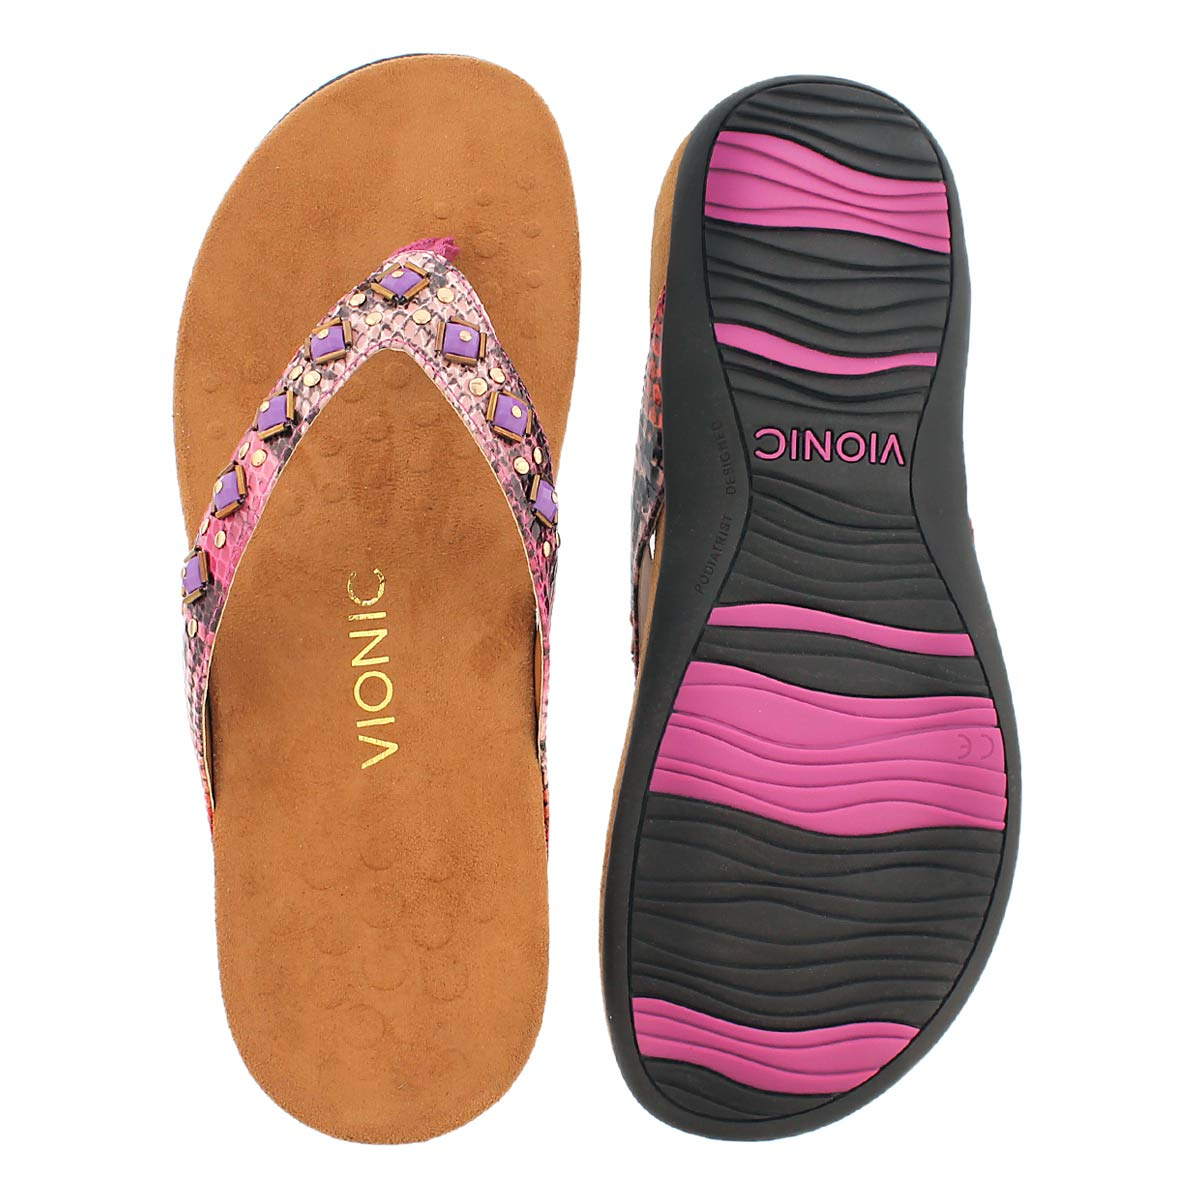 Lds Floriana pink arch support flip flop